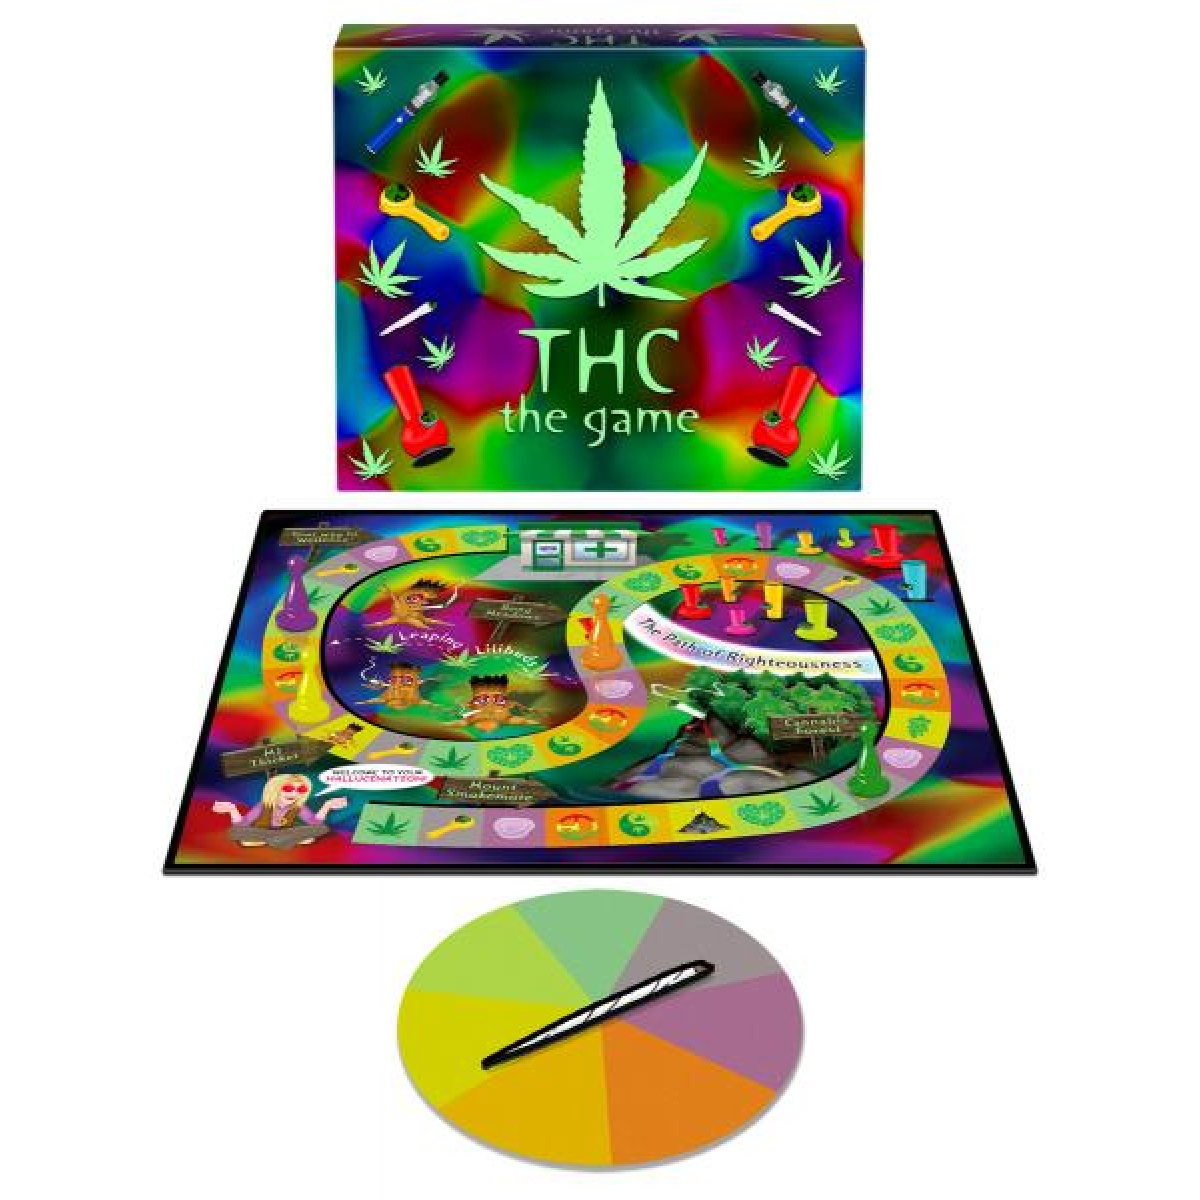 THC the Game.jpg